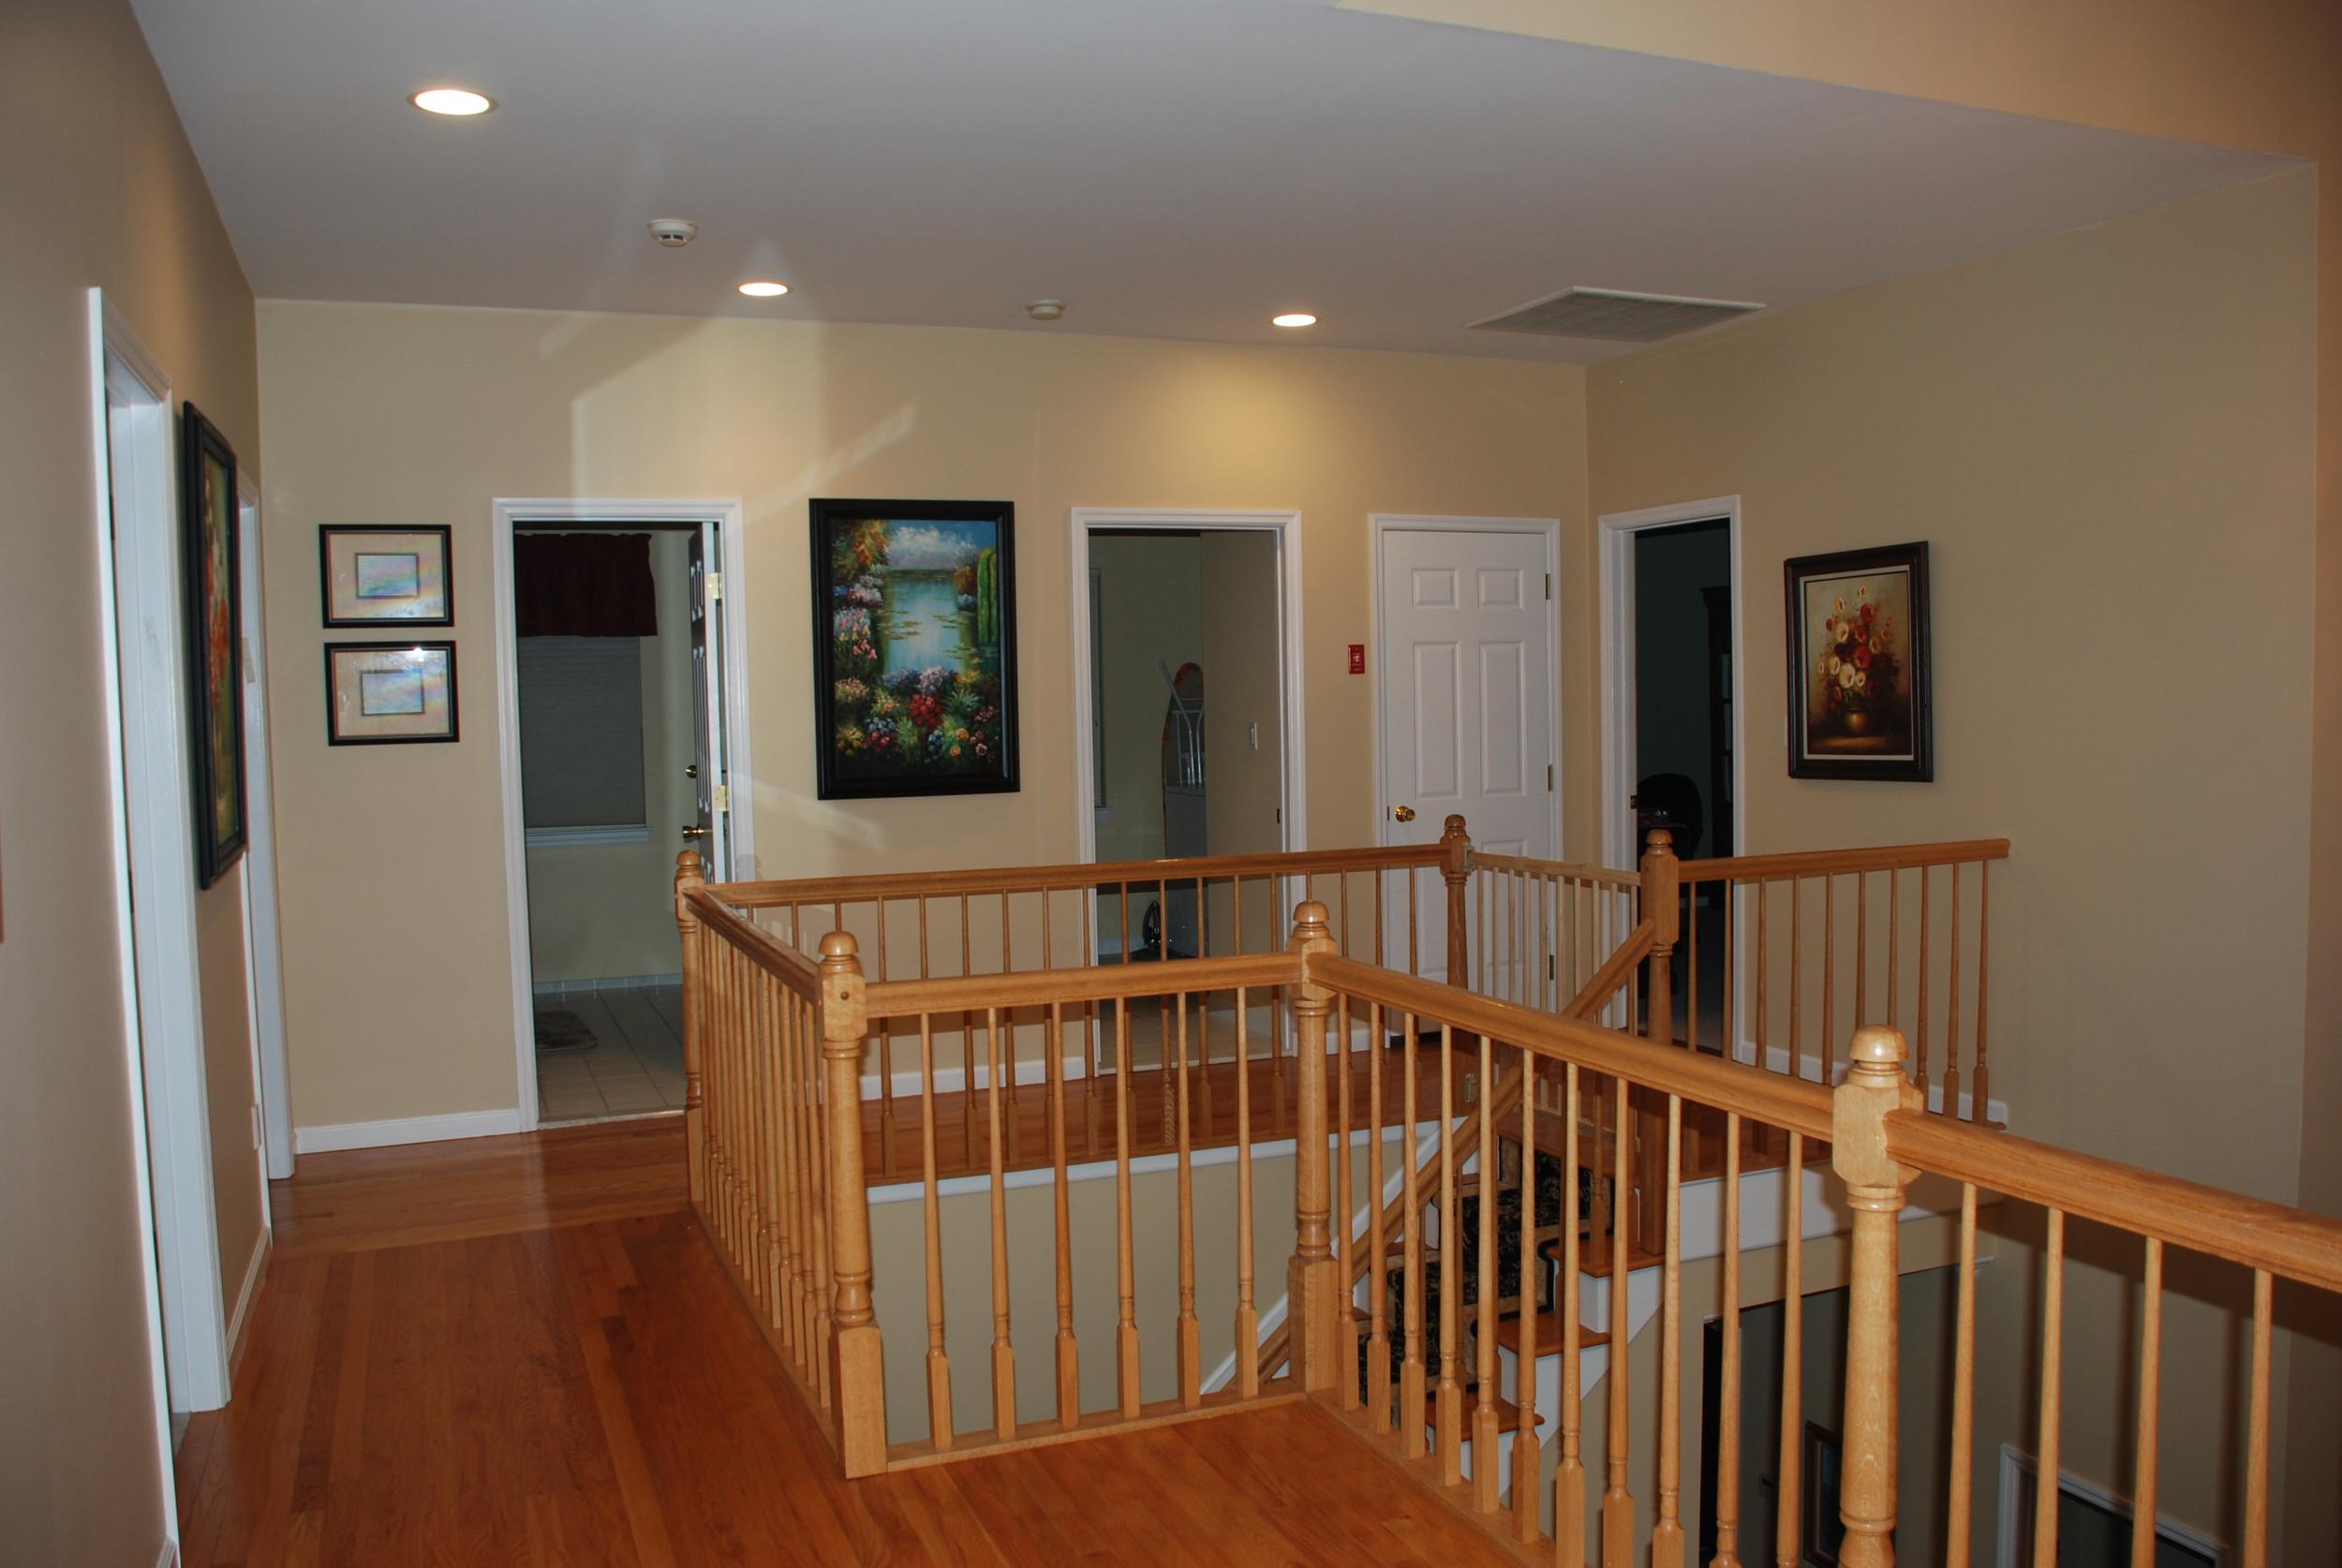 hardwood floor showroom nyc of home remodeling design gallery long island nyc ny inside 1433604117508